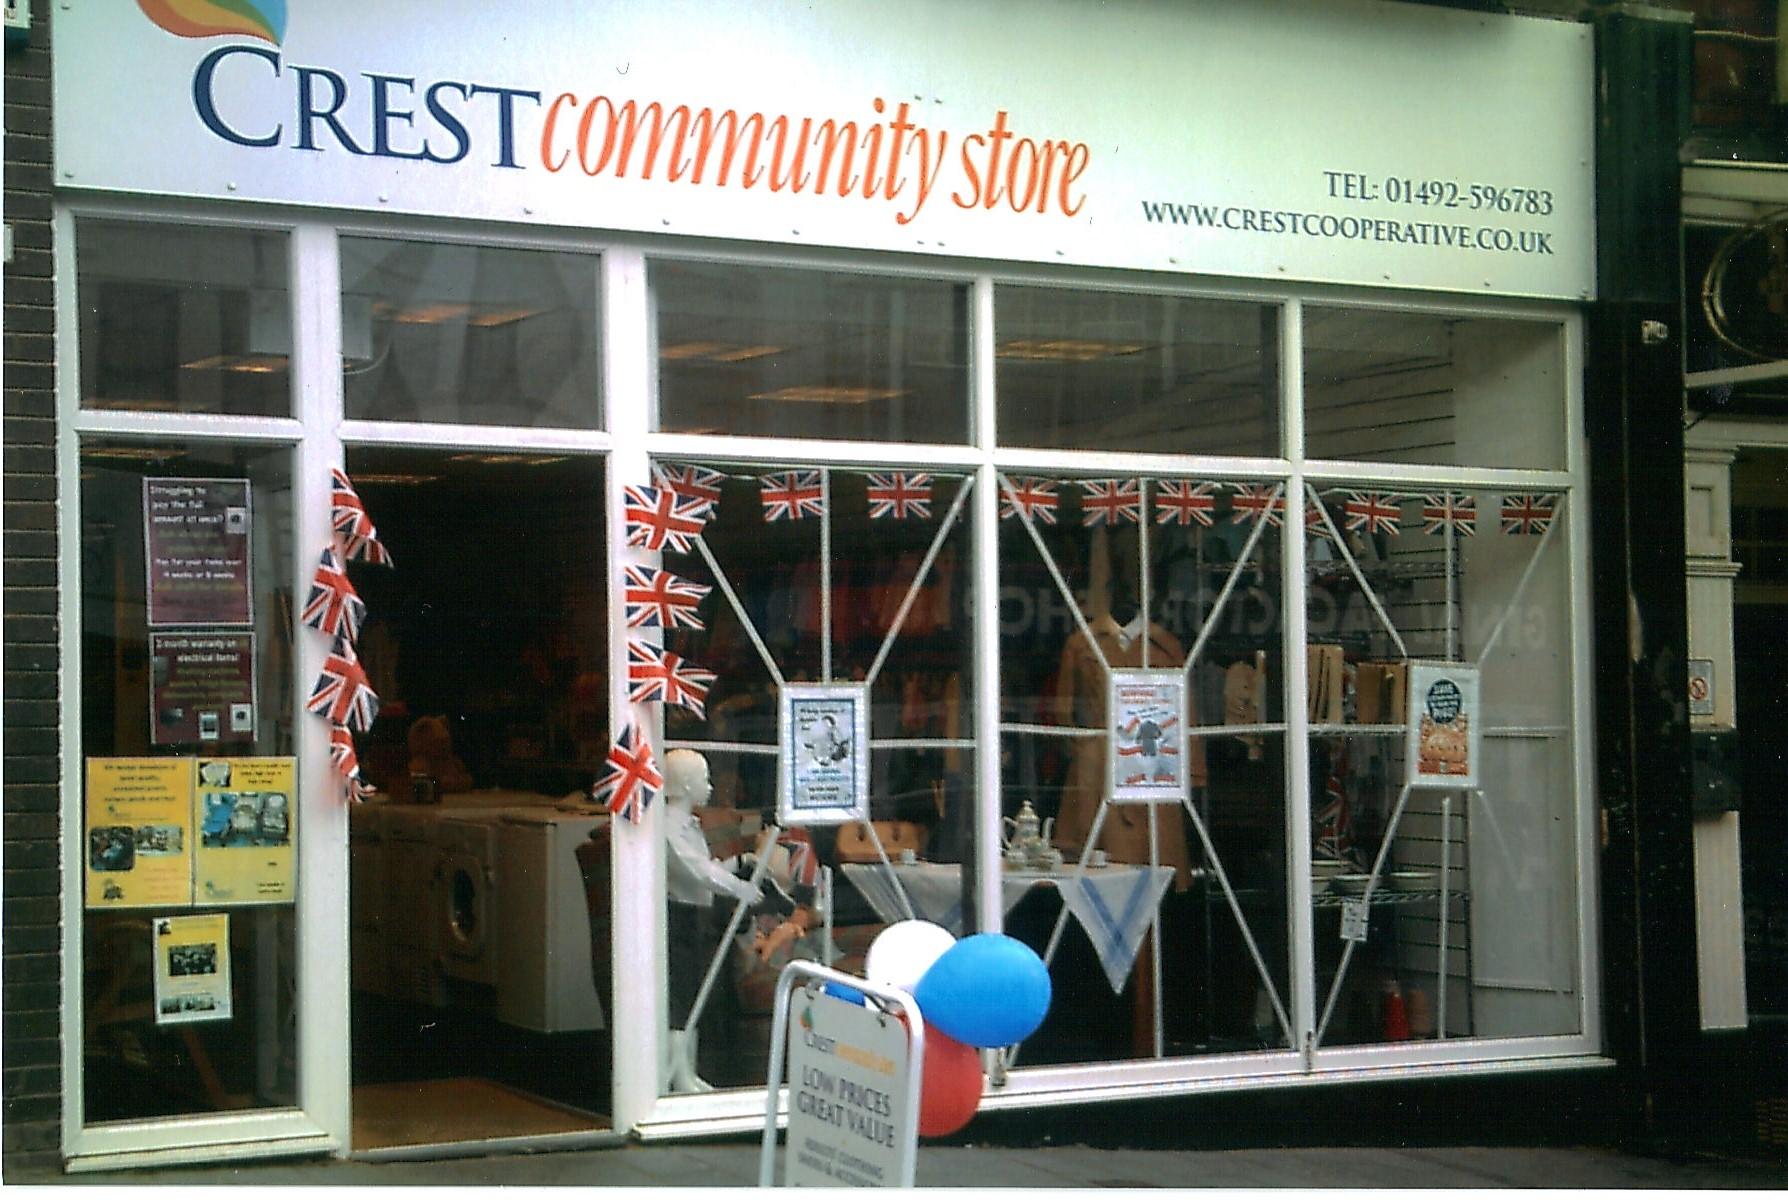 Crest Community Store in Colwyn Bay